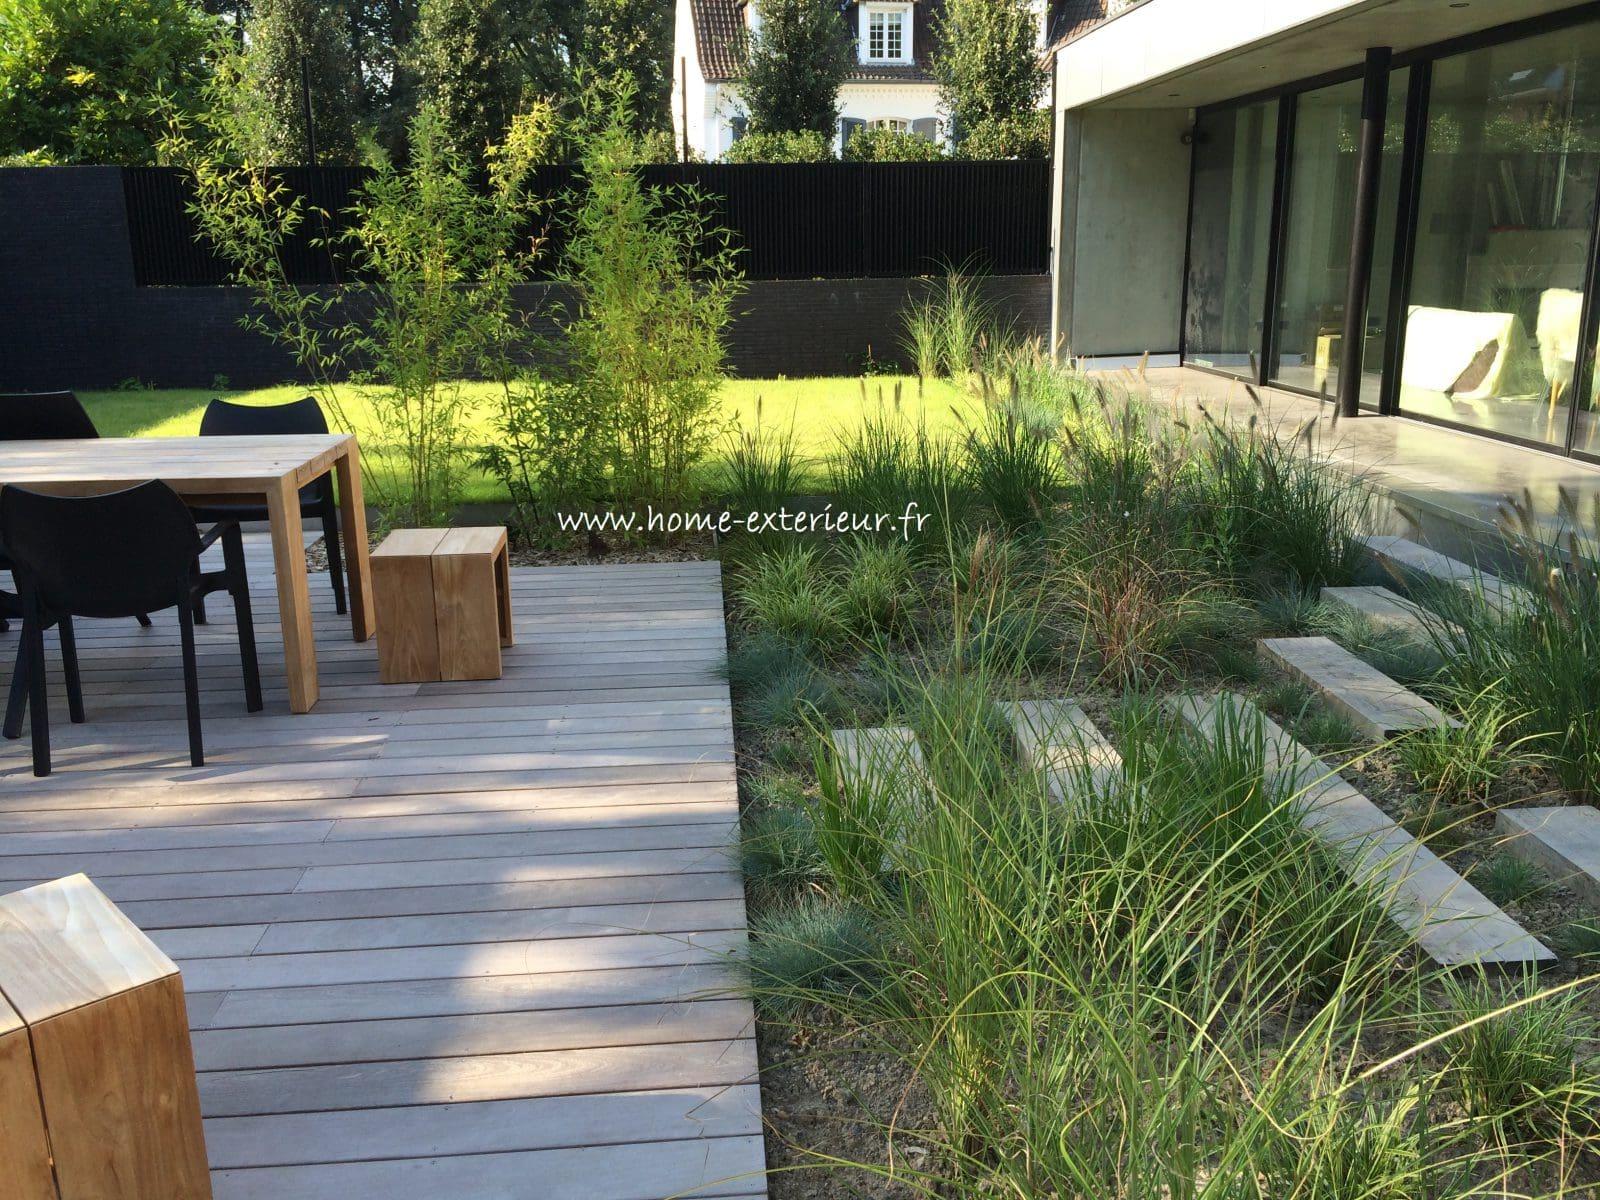 Architecte Paysagiste terrasses jardins - Nord - Lille ...